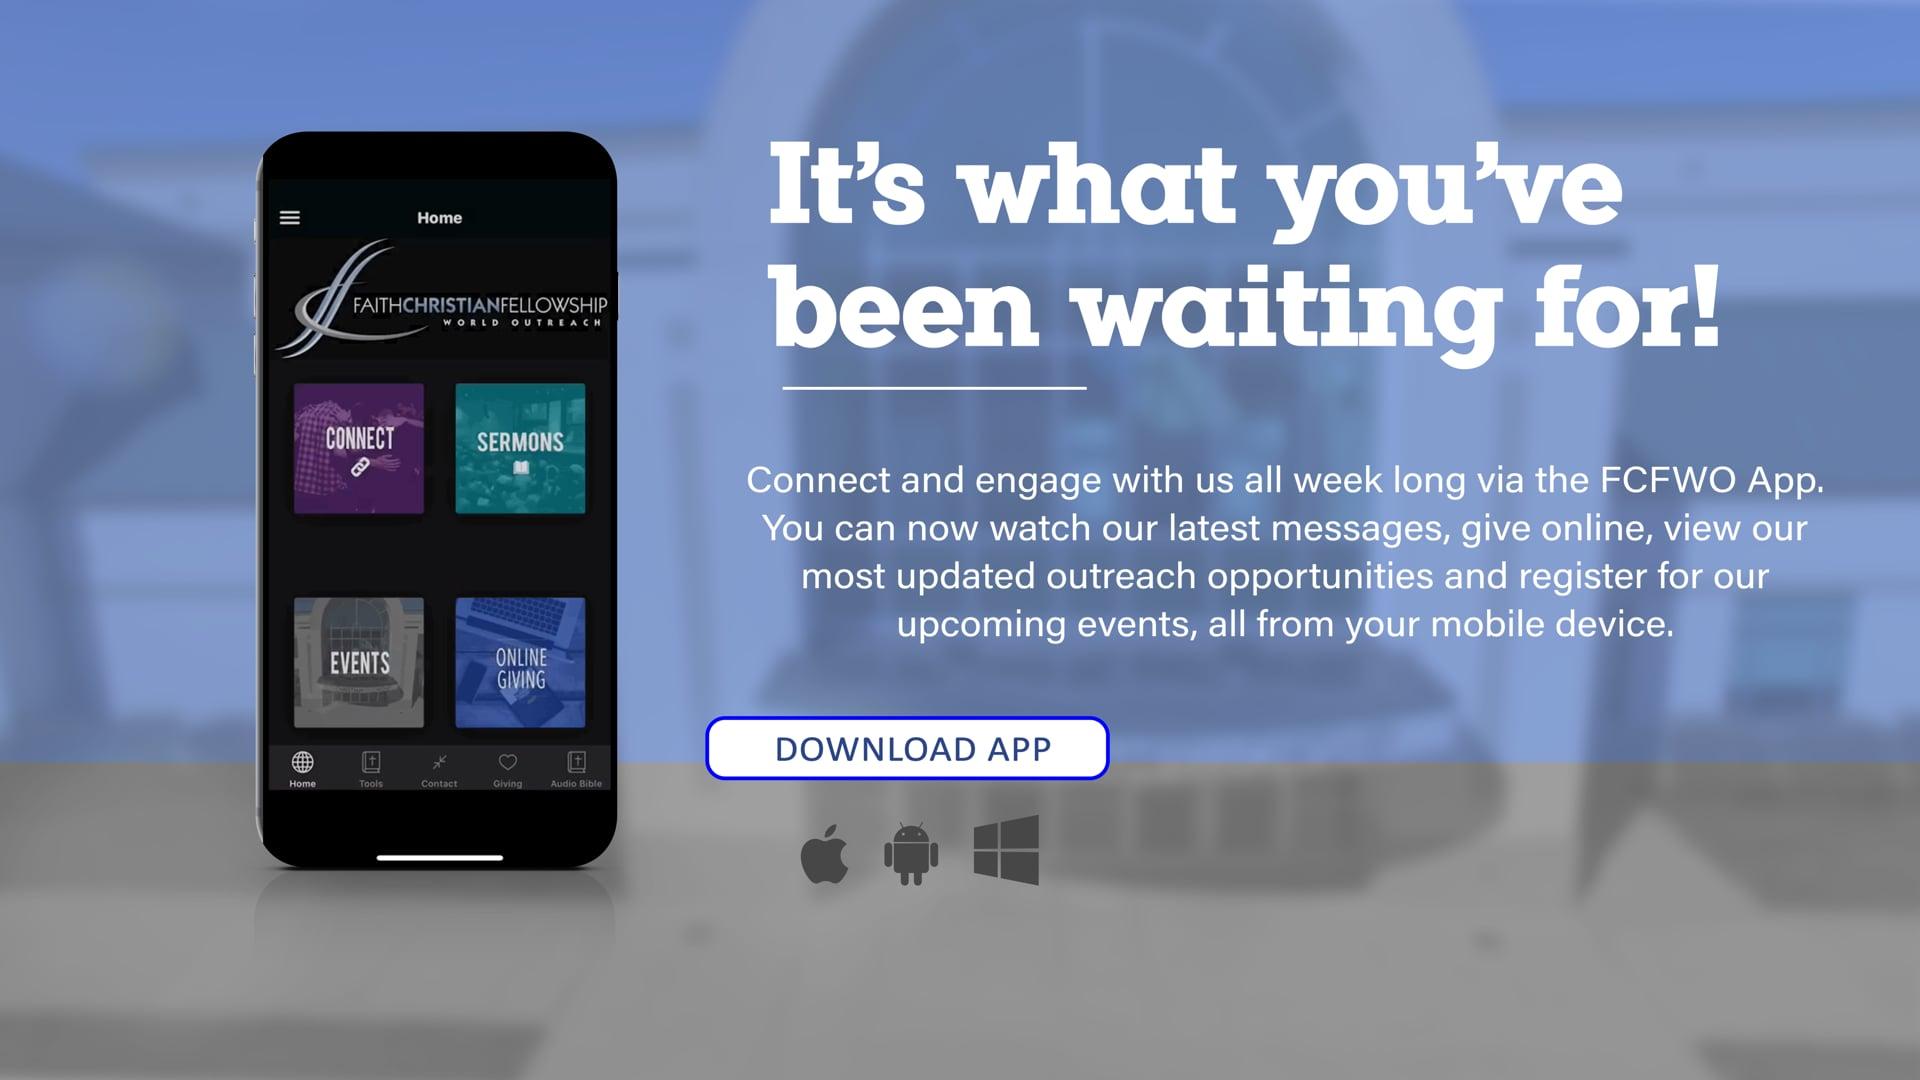 Church App Launch Promo